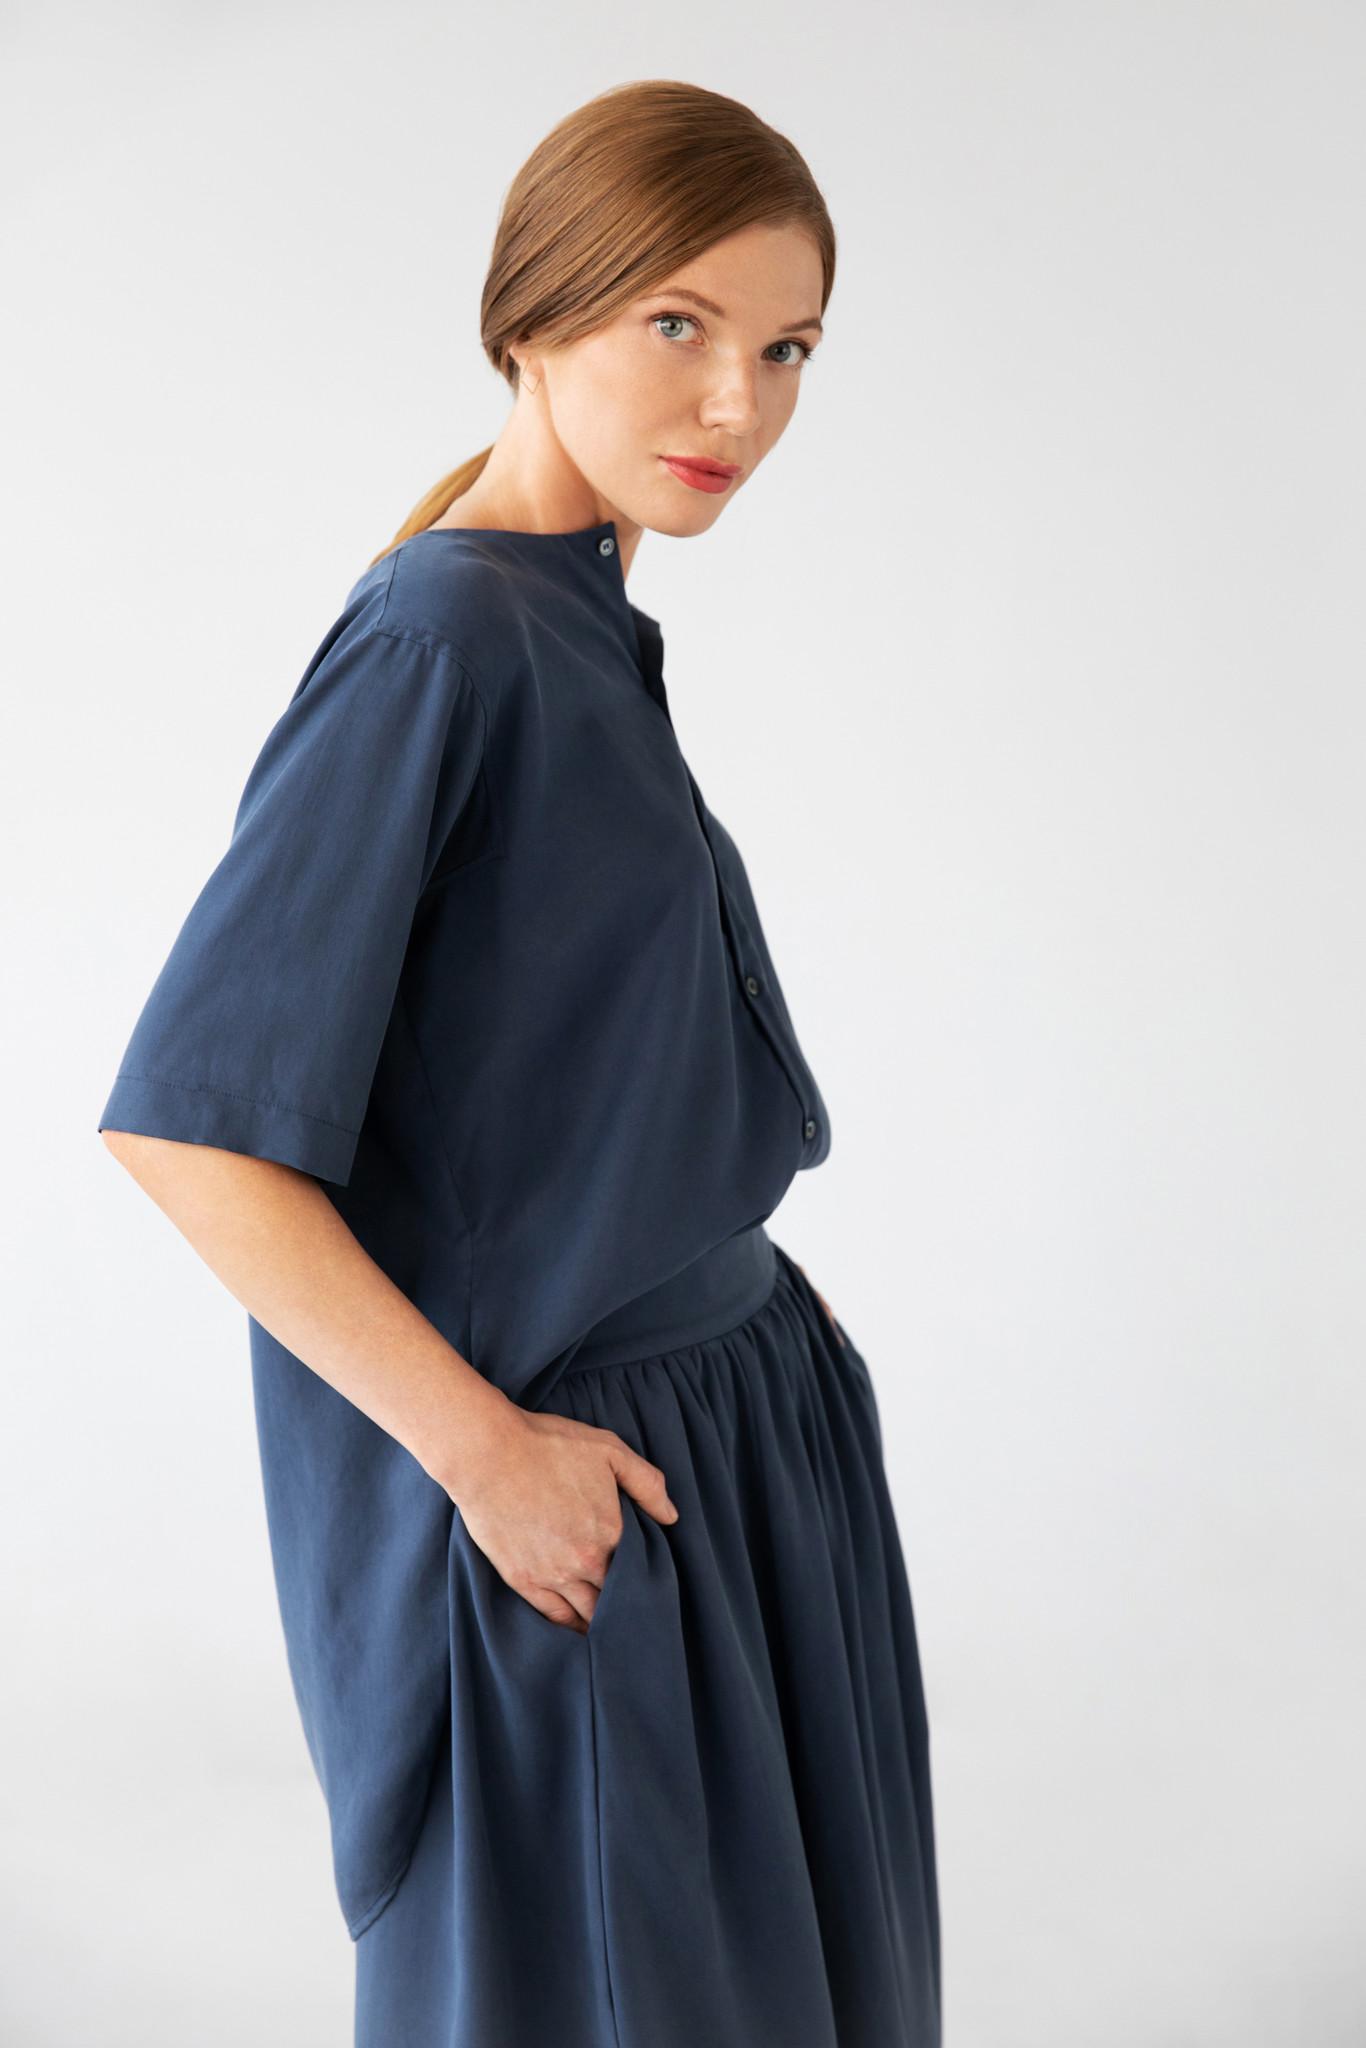 Bluse mit kurzem Arm aus Tencel - Blau-2